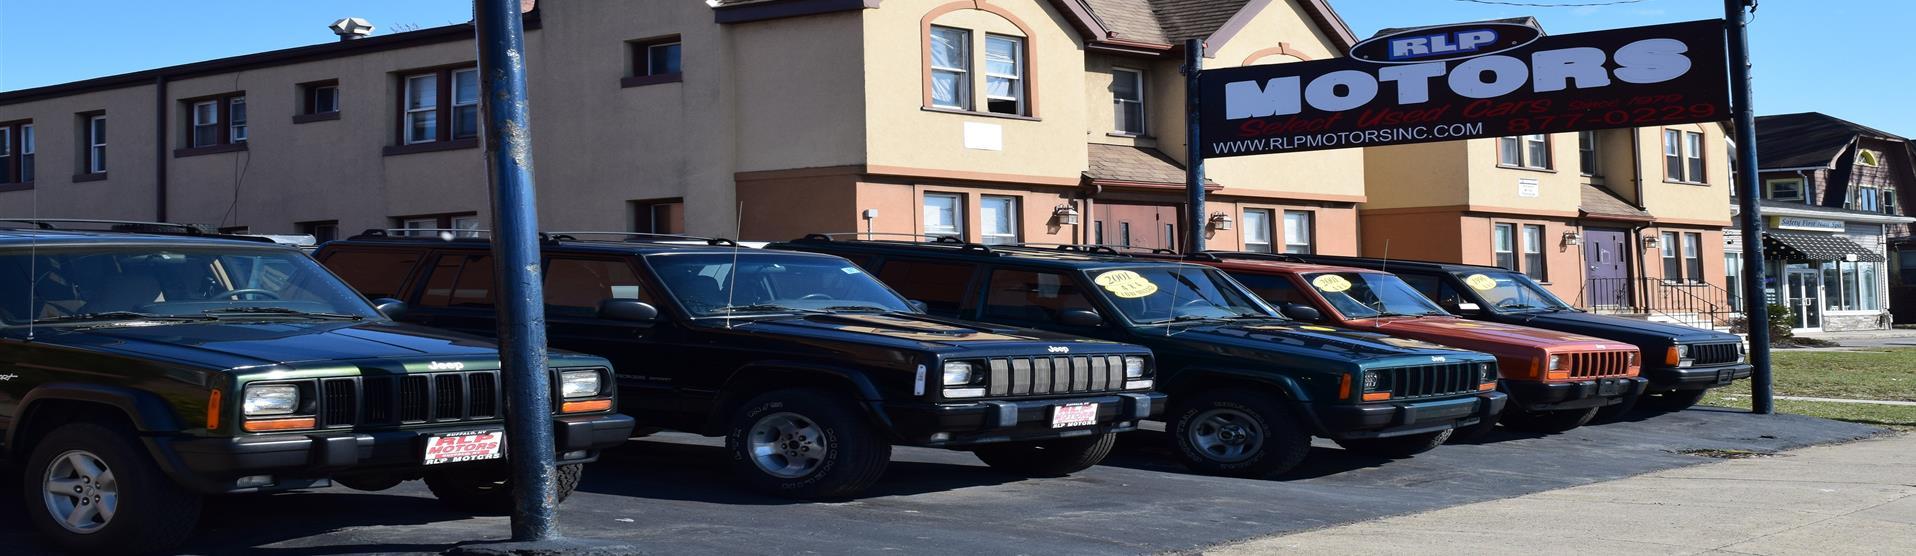 Used Cars Buffalo >> Used Cars Buffalo Ny Used Cars Trucks Ny Rlp Motors Inc